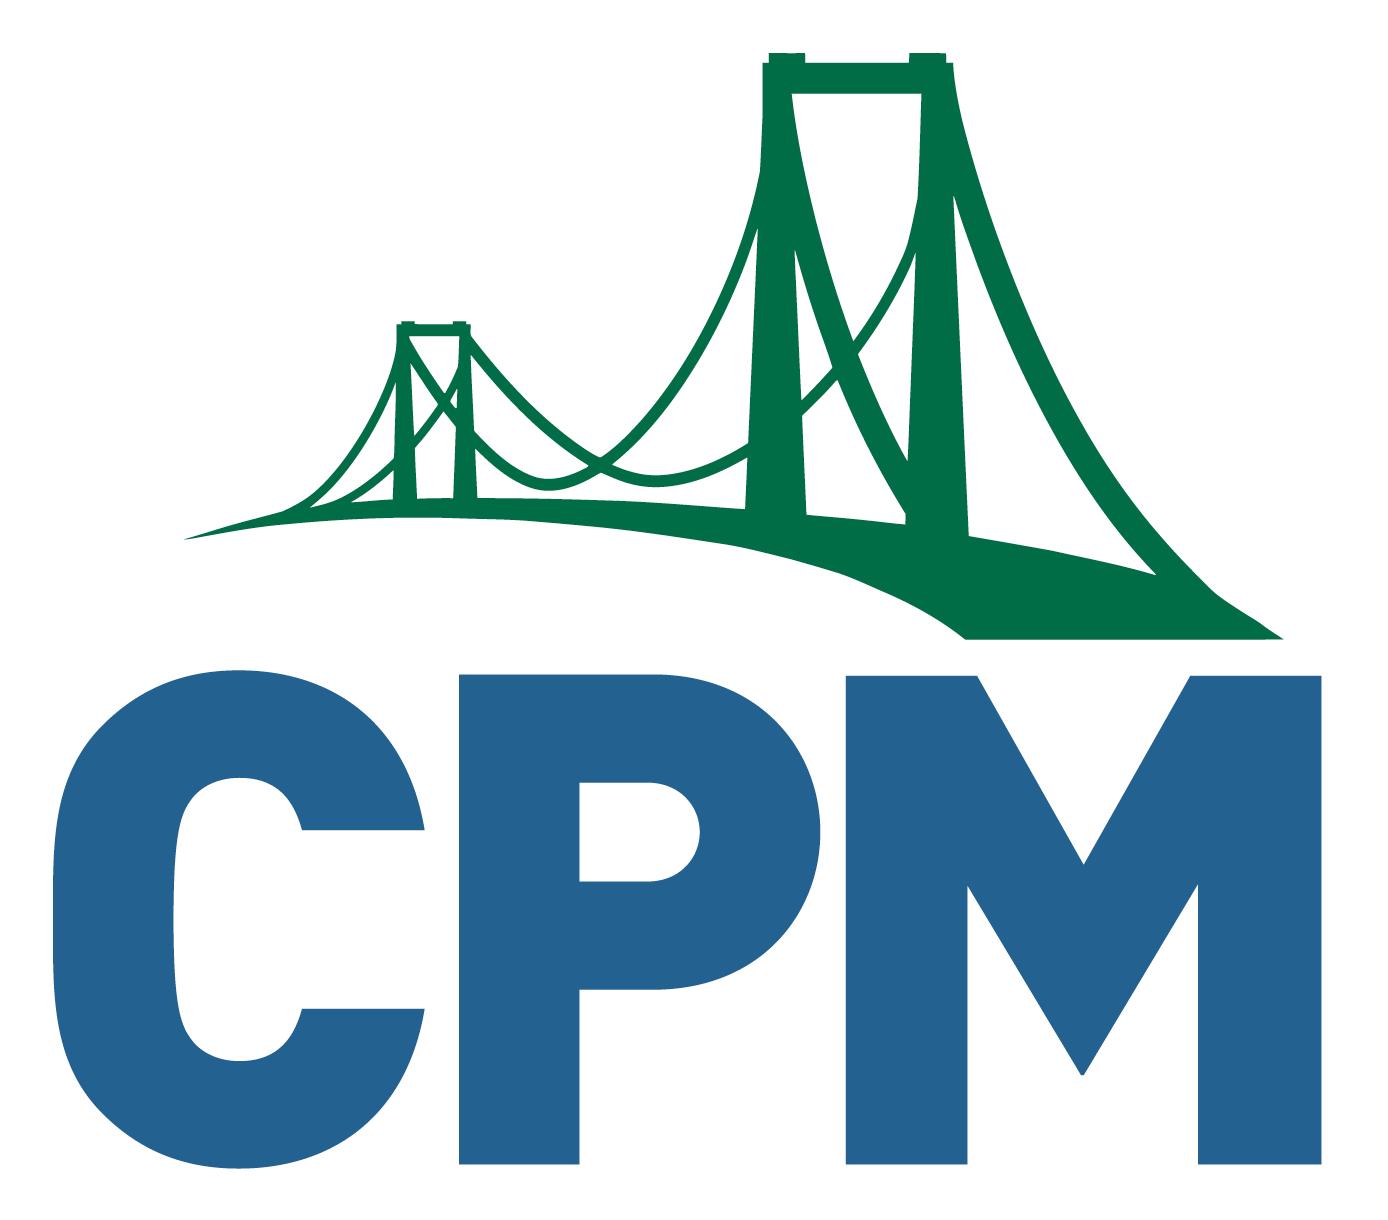 2017 Cpm Teacher Conference Feedback Form Survey